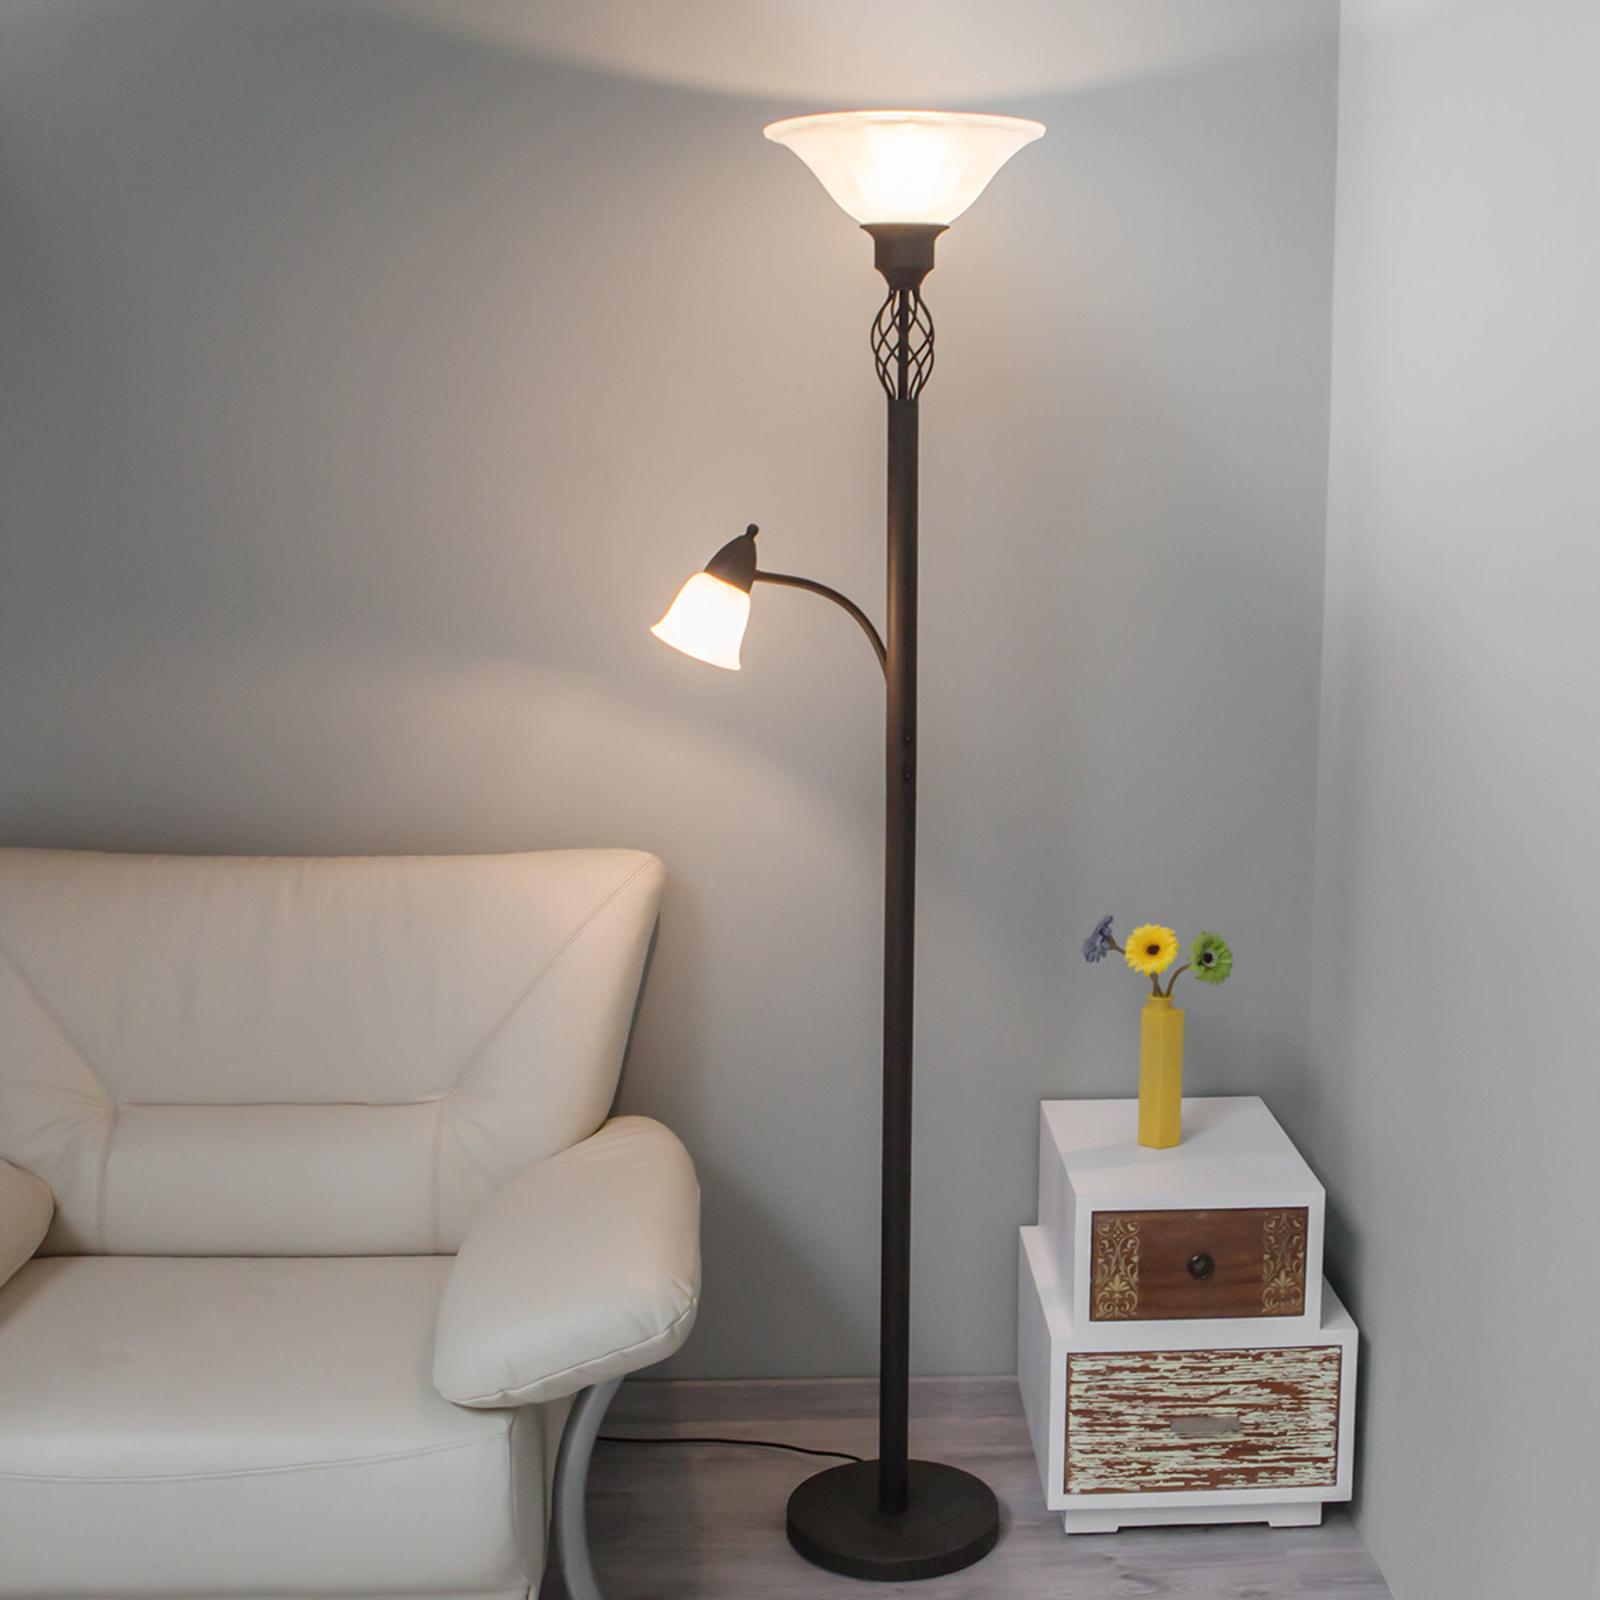 Uplight-lampe Dunja med LED-lys og leselampe